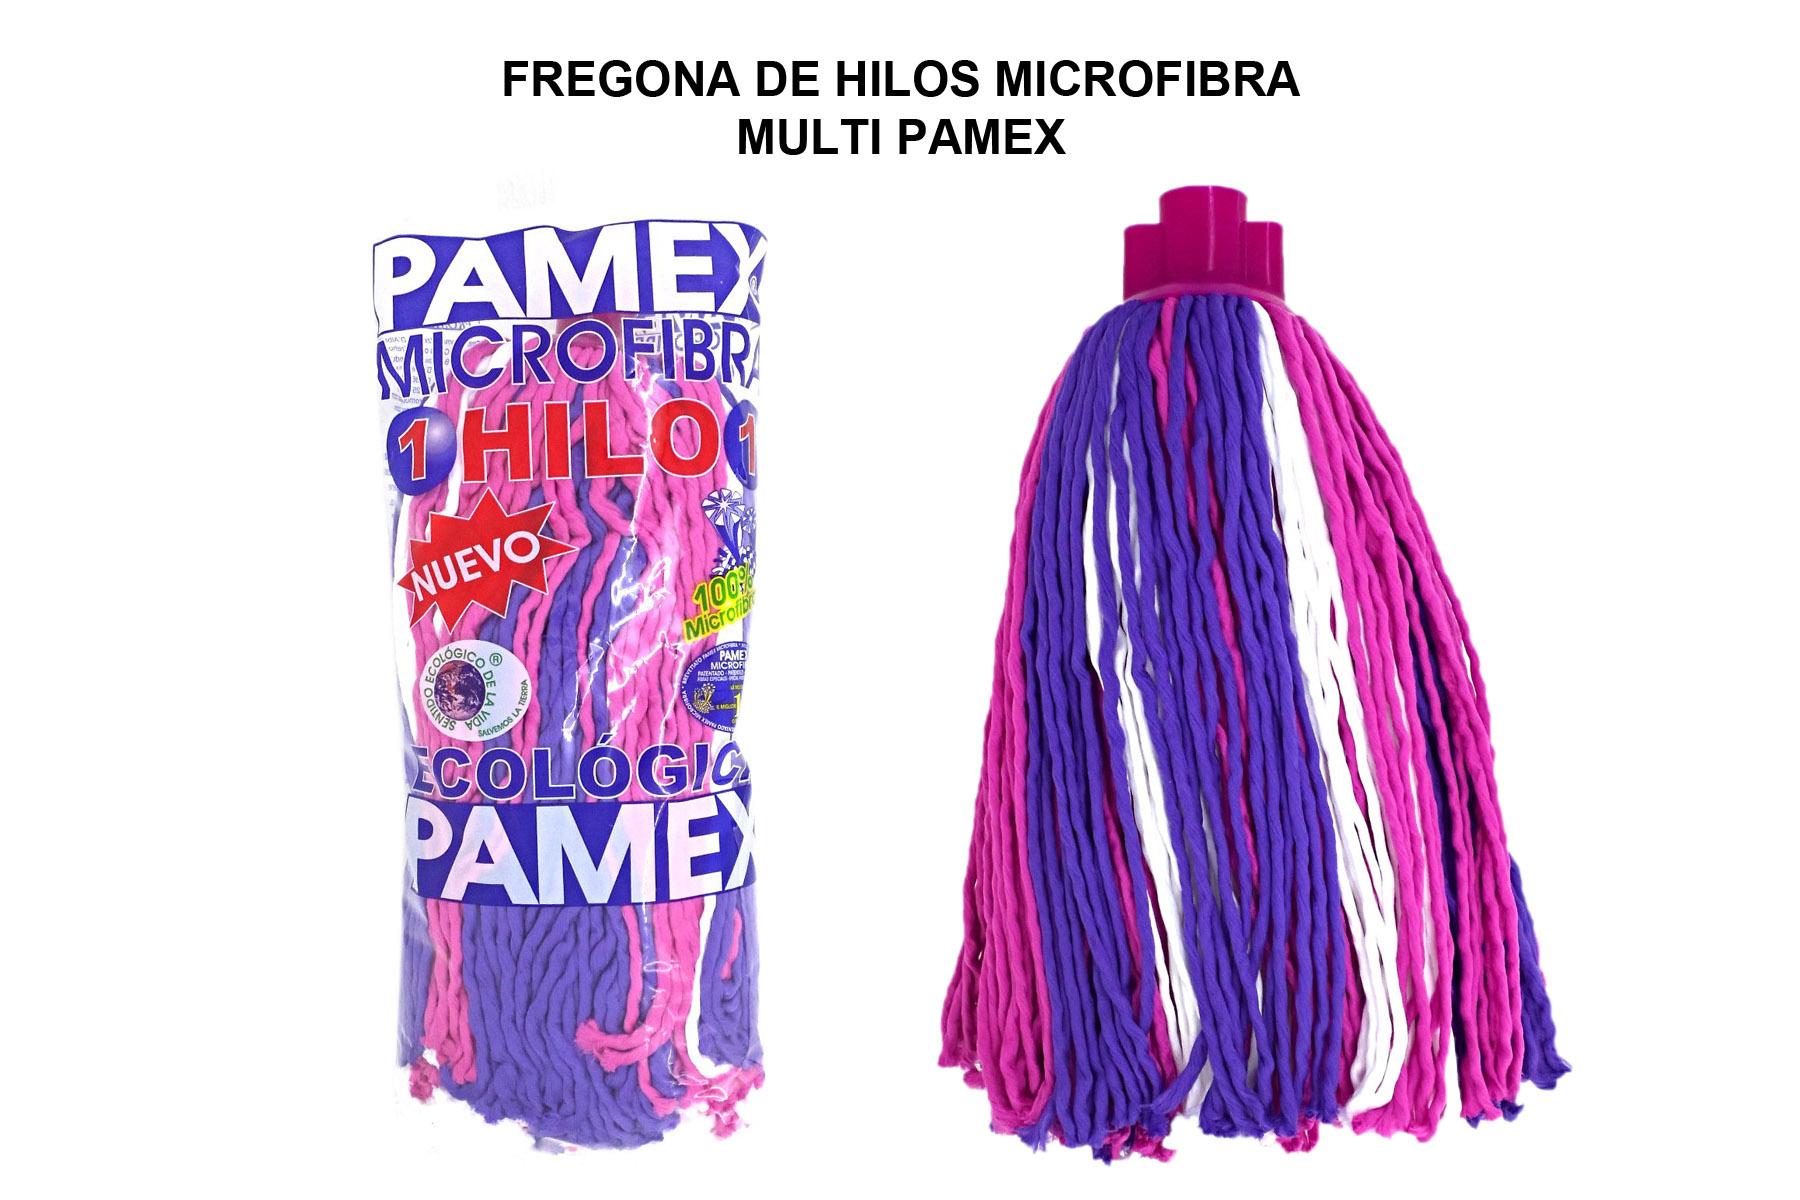 FREGONA DE HILOS MICROFIBRA MULTI PAMEX